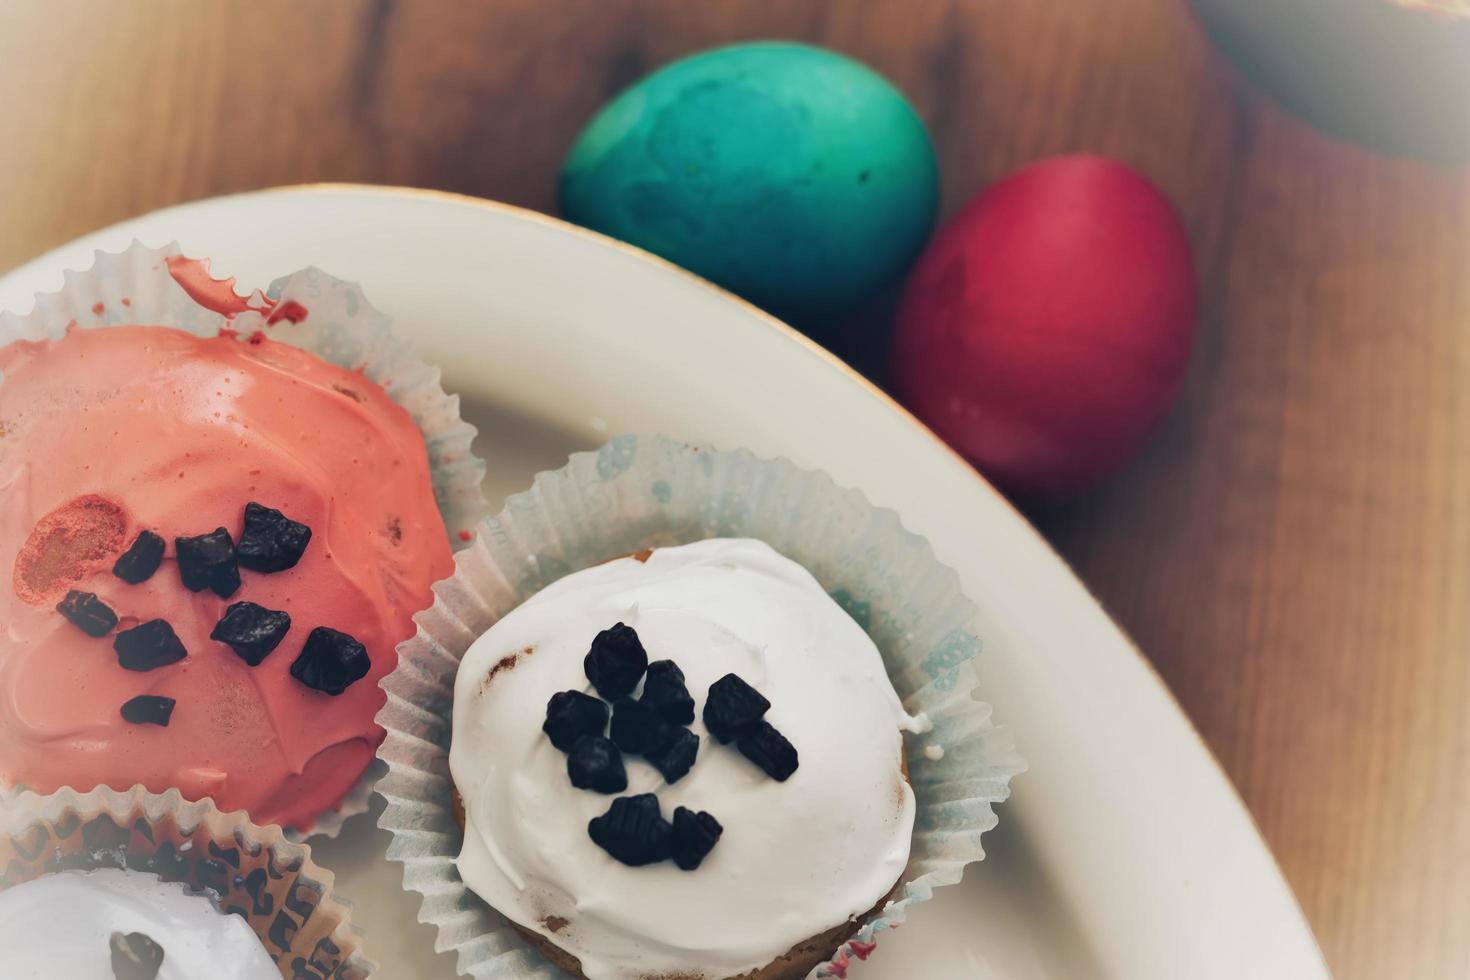 paaseieren en cup cake foto